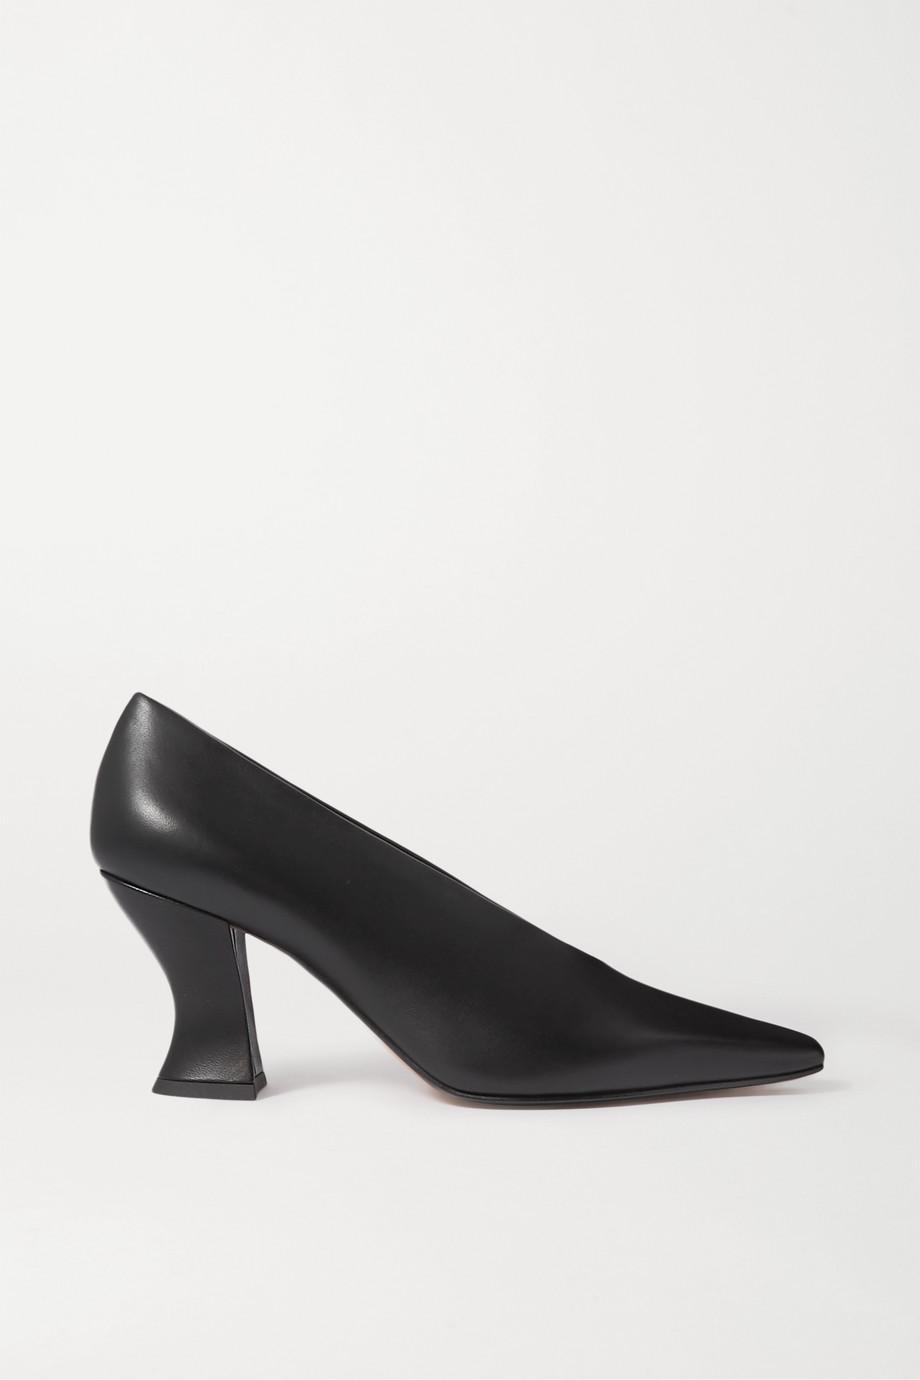 Bottega Veneta Almond 皮革高跟鞋